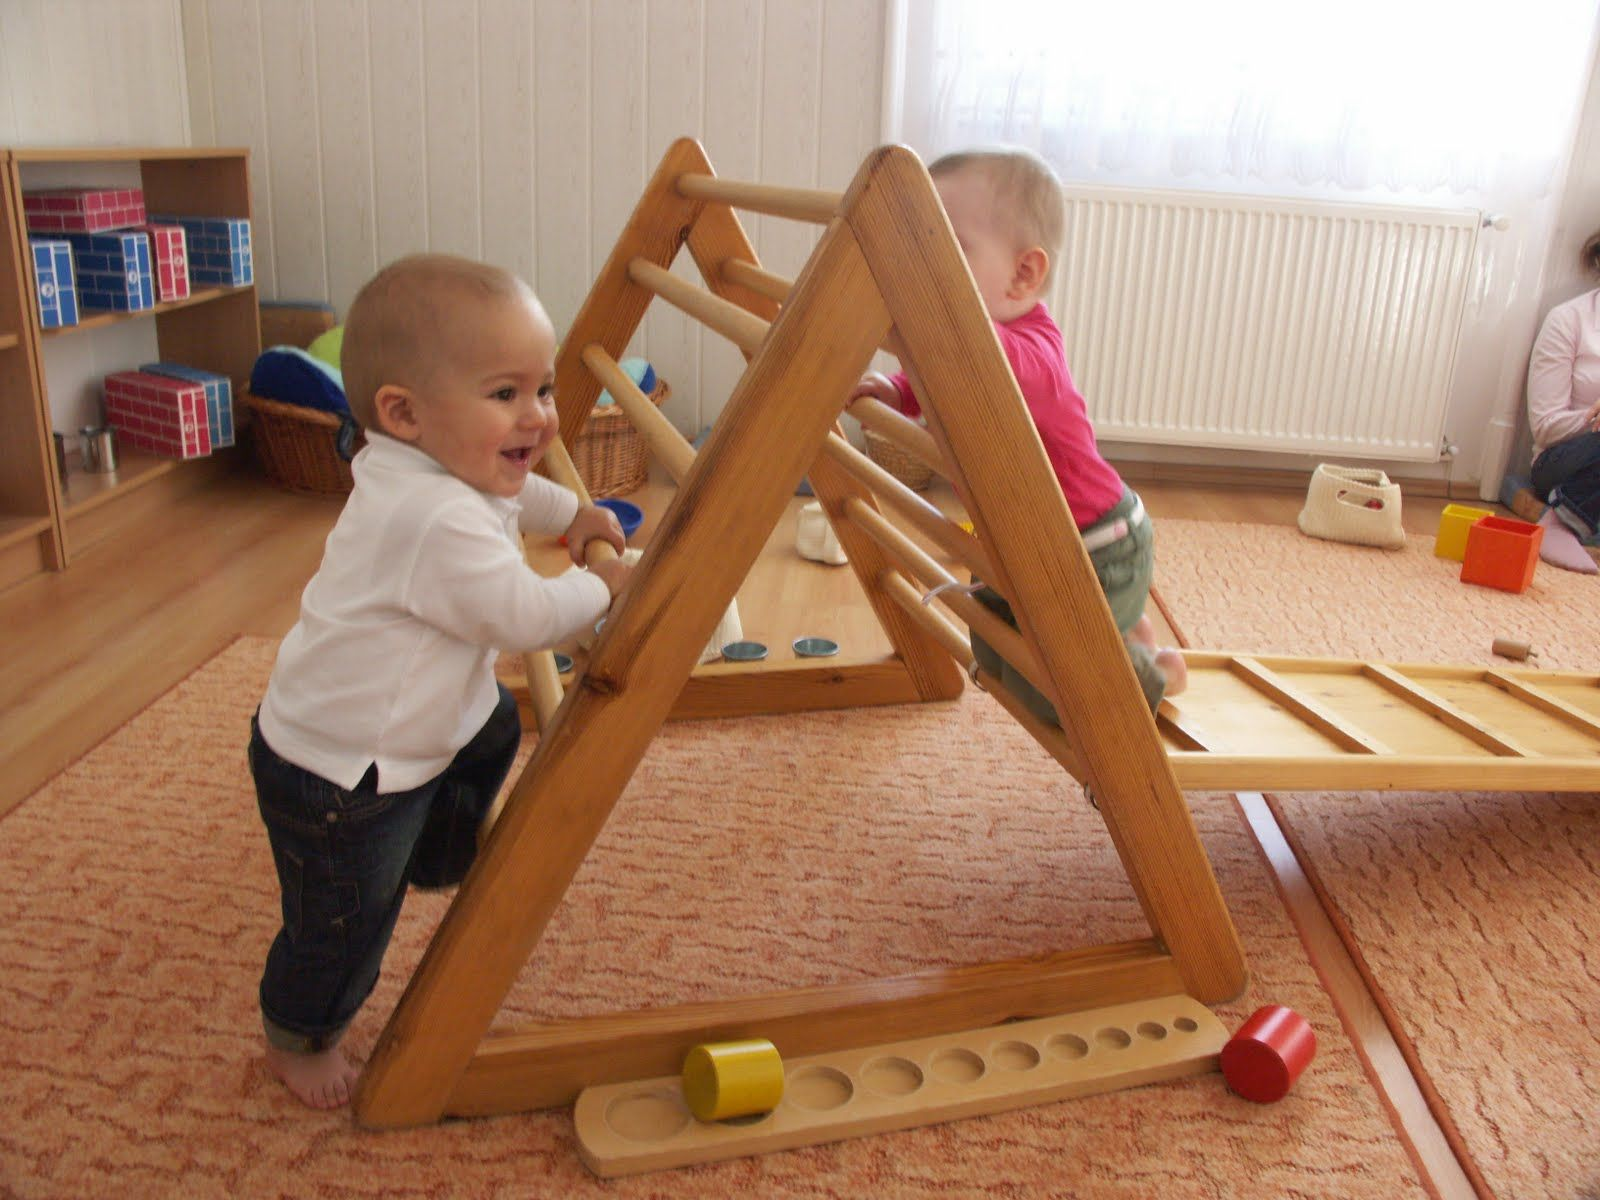 E Pikleres Izpratne Par Bērnu Attīstību With Images Playroom Infant Activities Toddler Play